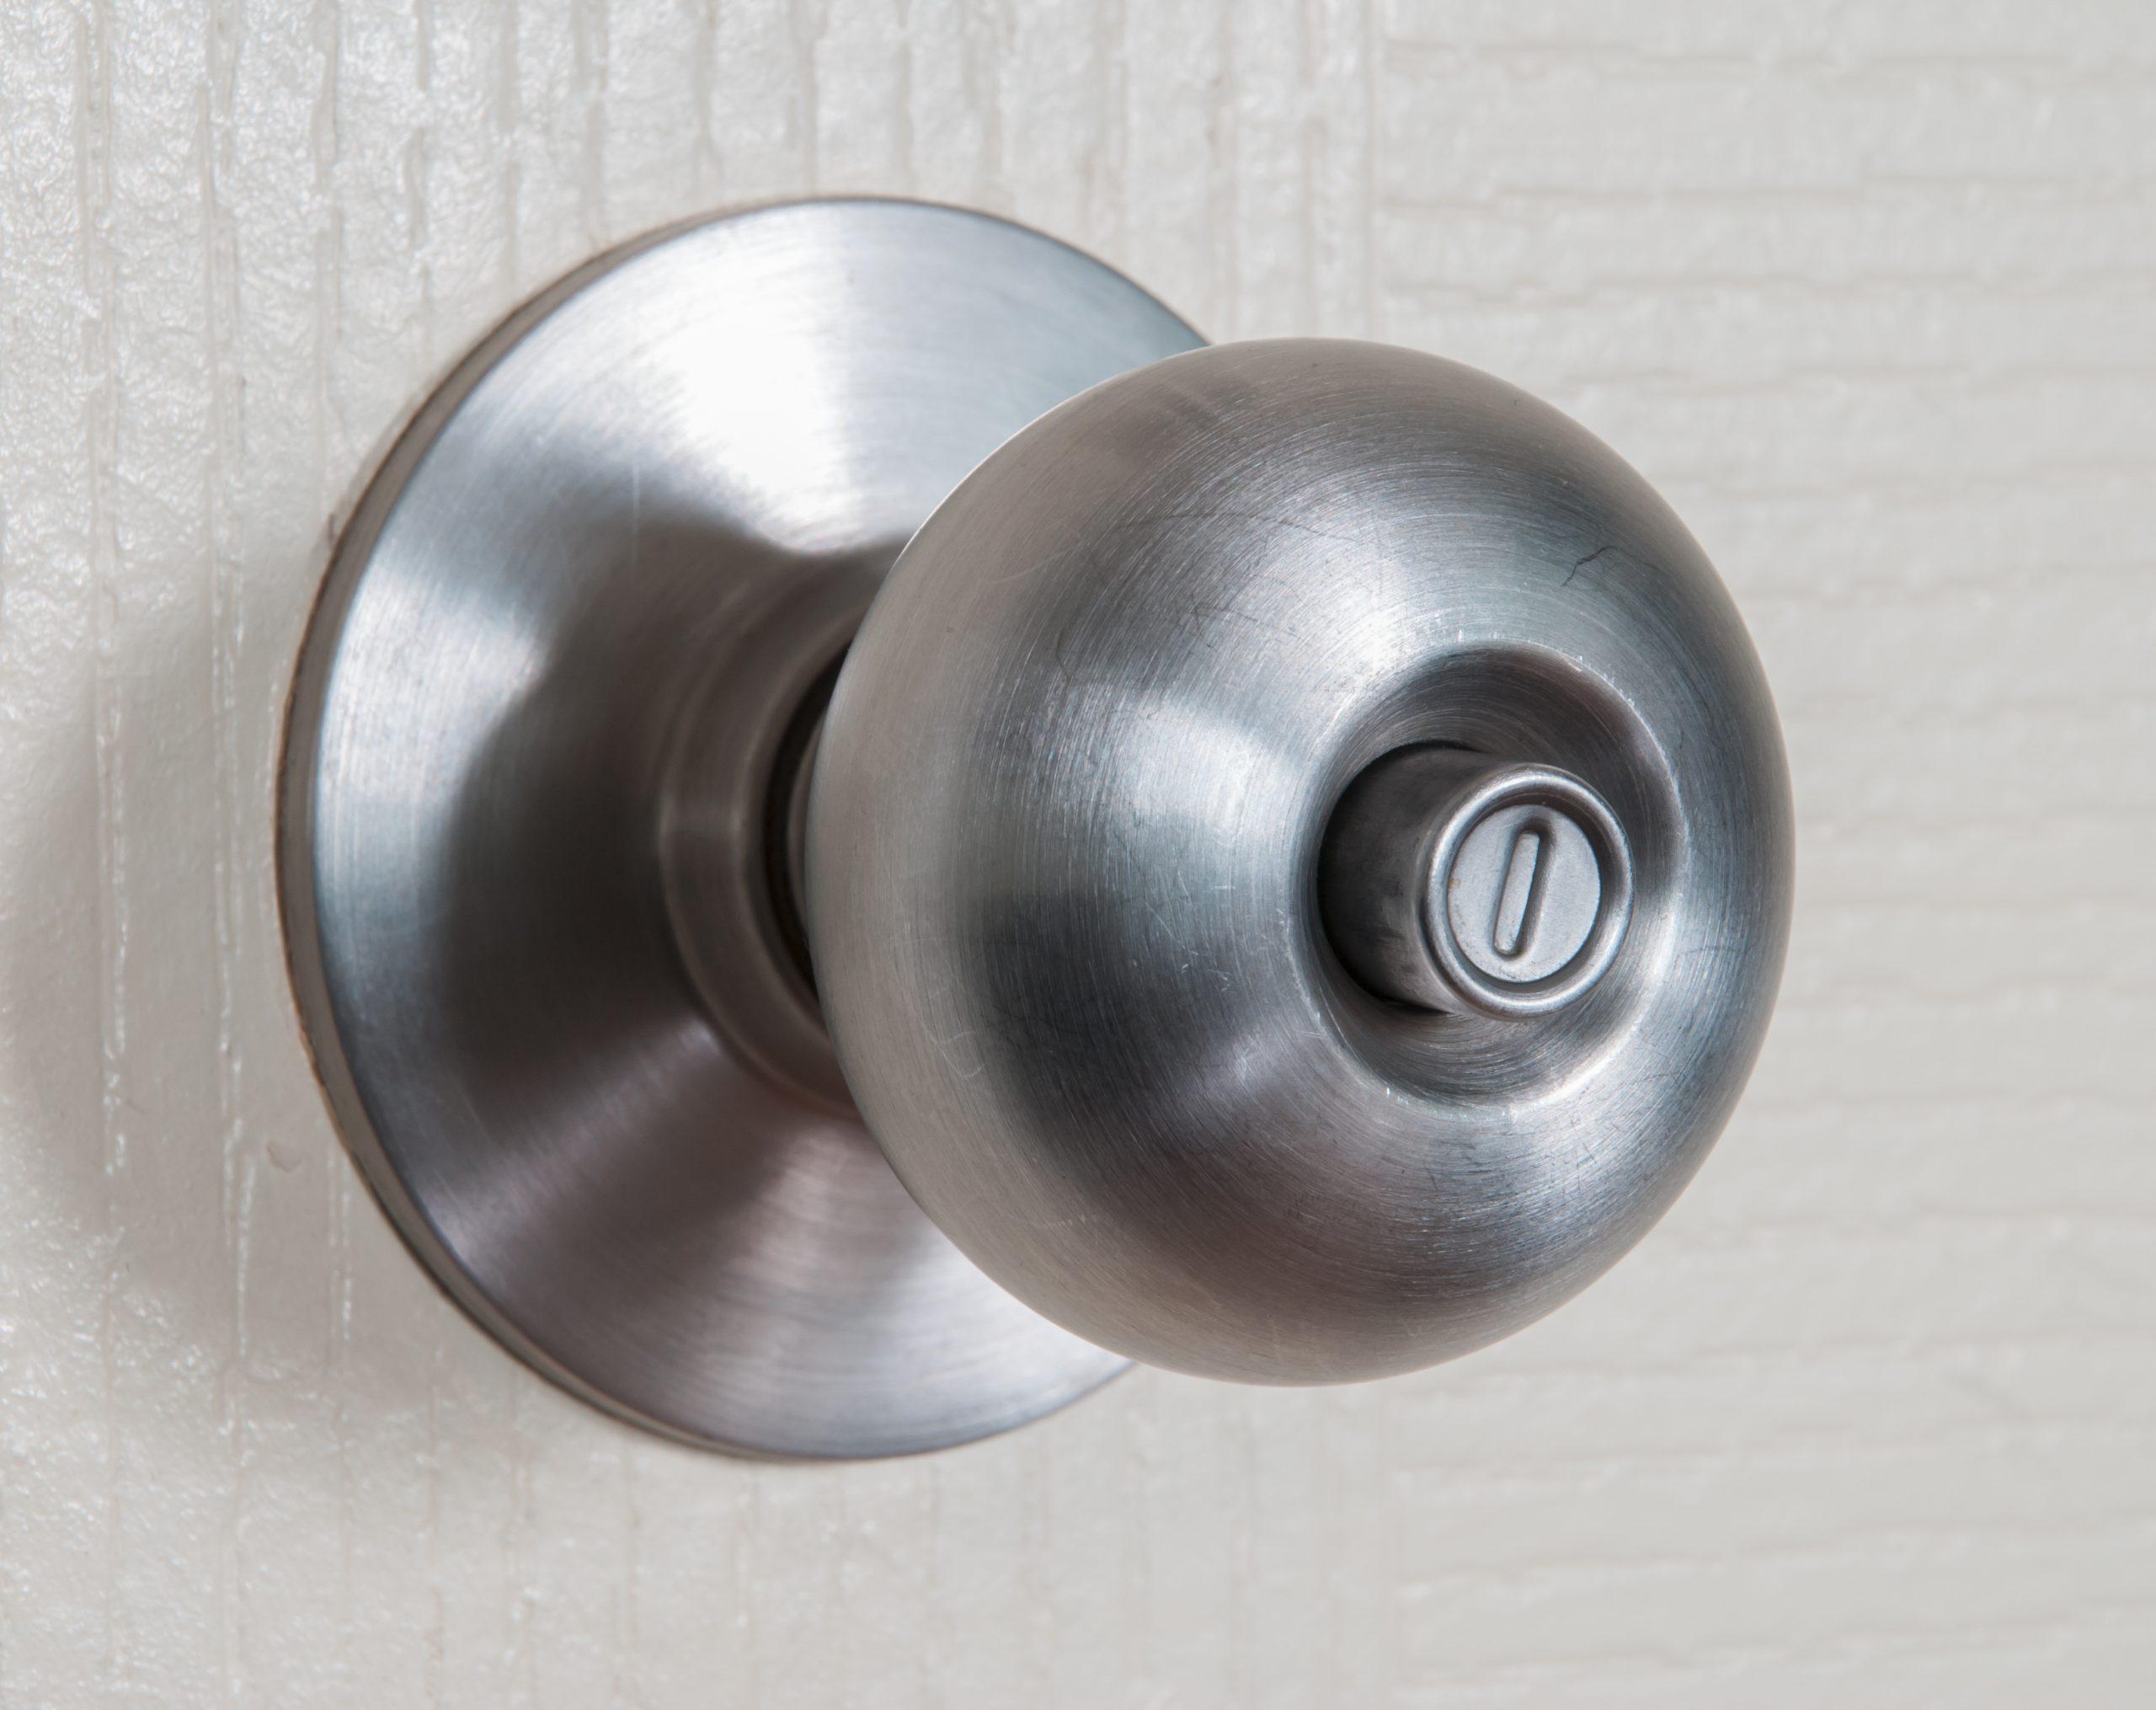 Close,Up,Shot,Of,Stainless,Steel,Round,Ball,Door,Knob